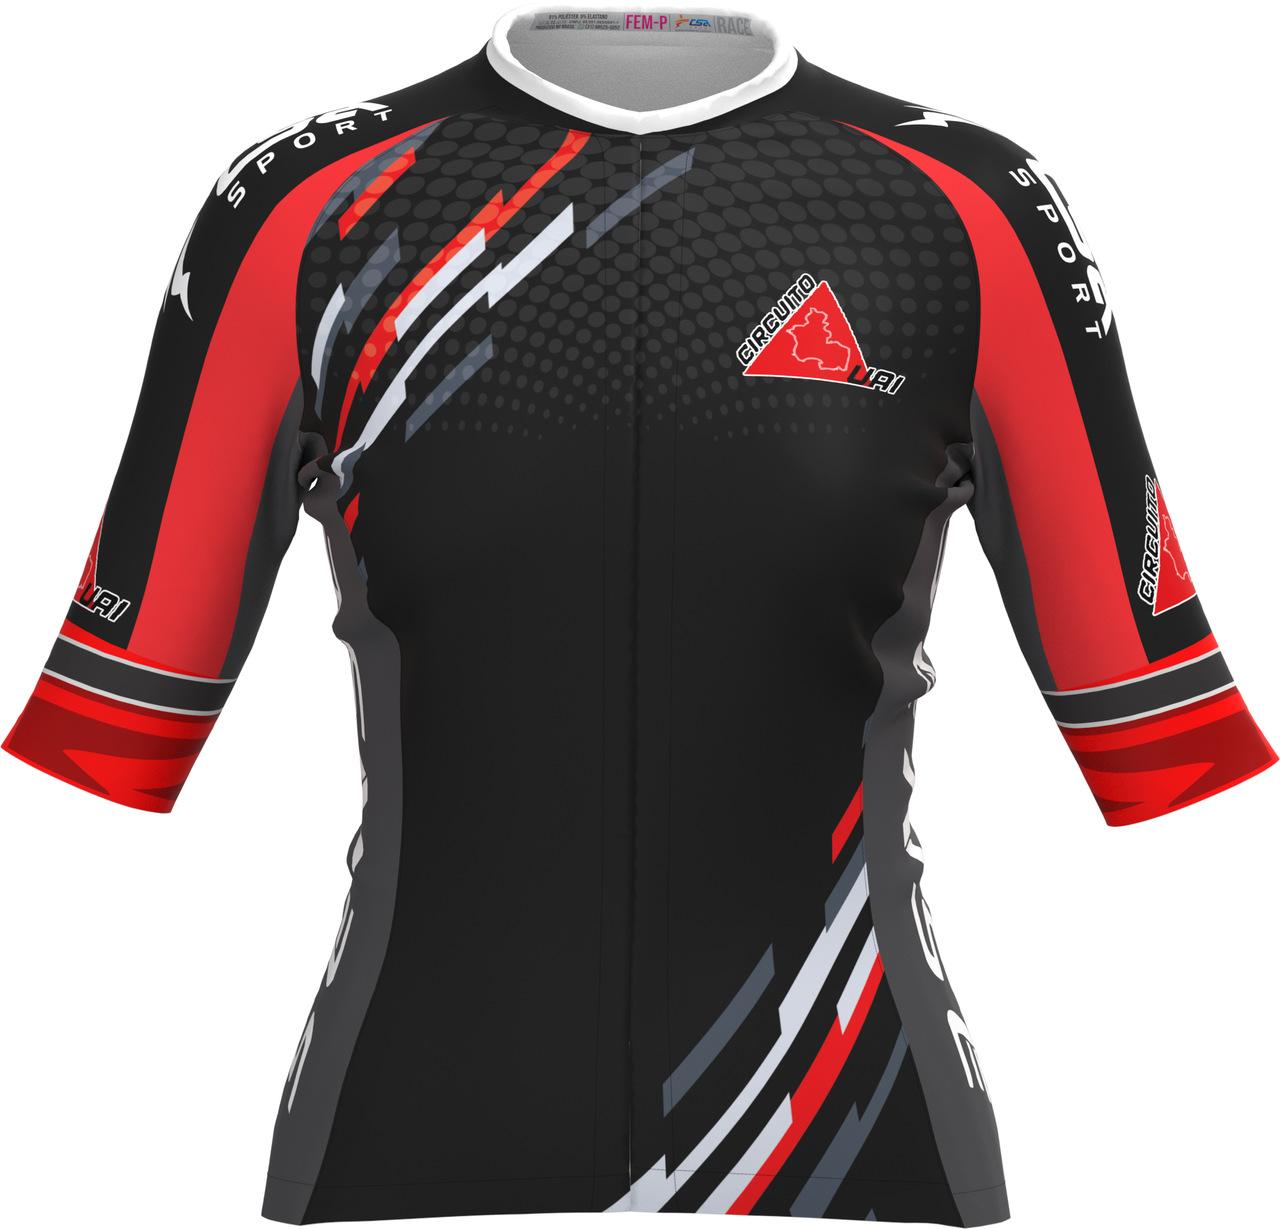 Camisa Ciclista Tour Circuito Uai Feminina Manga Curta